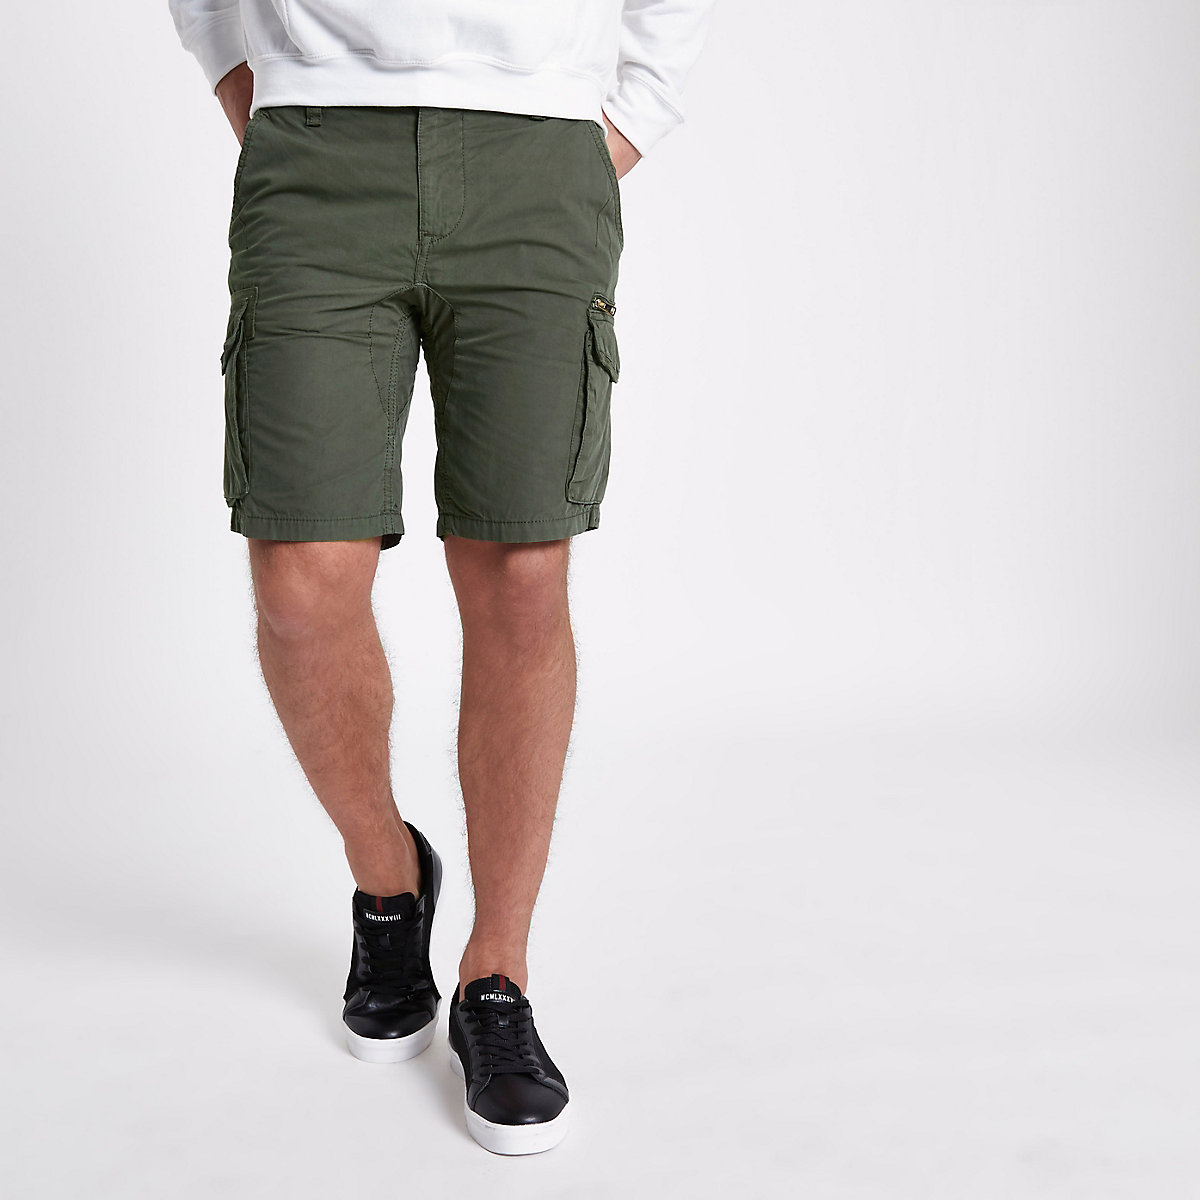 Khaki green slim fit cargo shorts